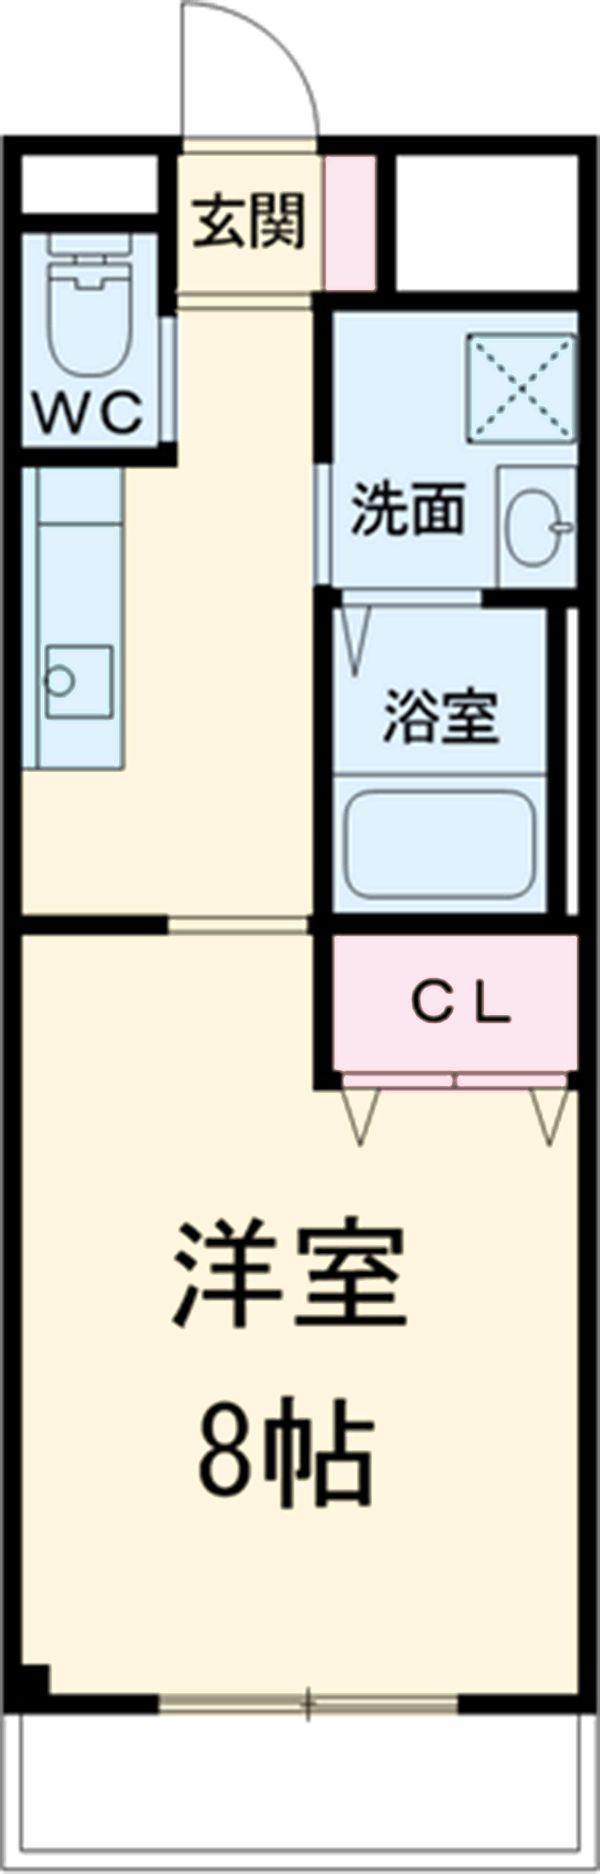 Lien 横濱 賃貸マンション